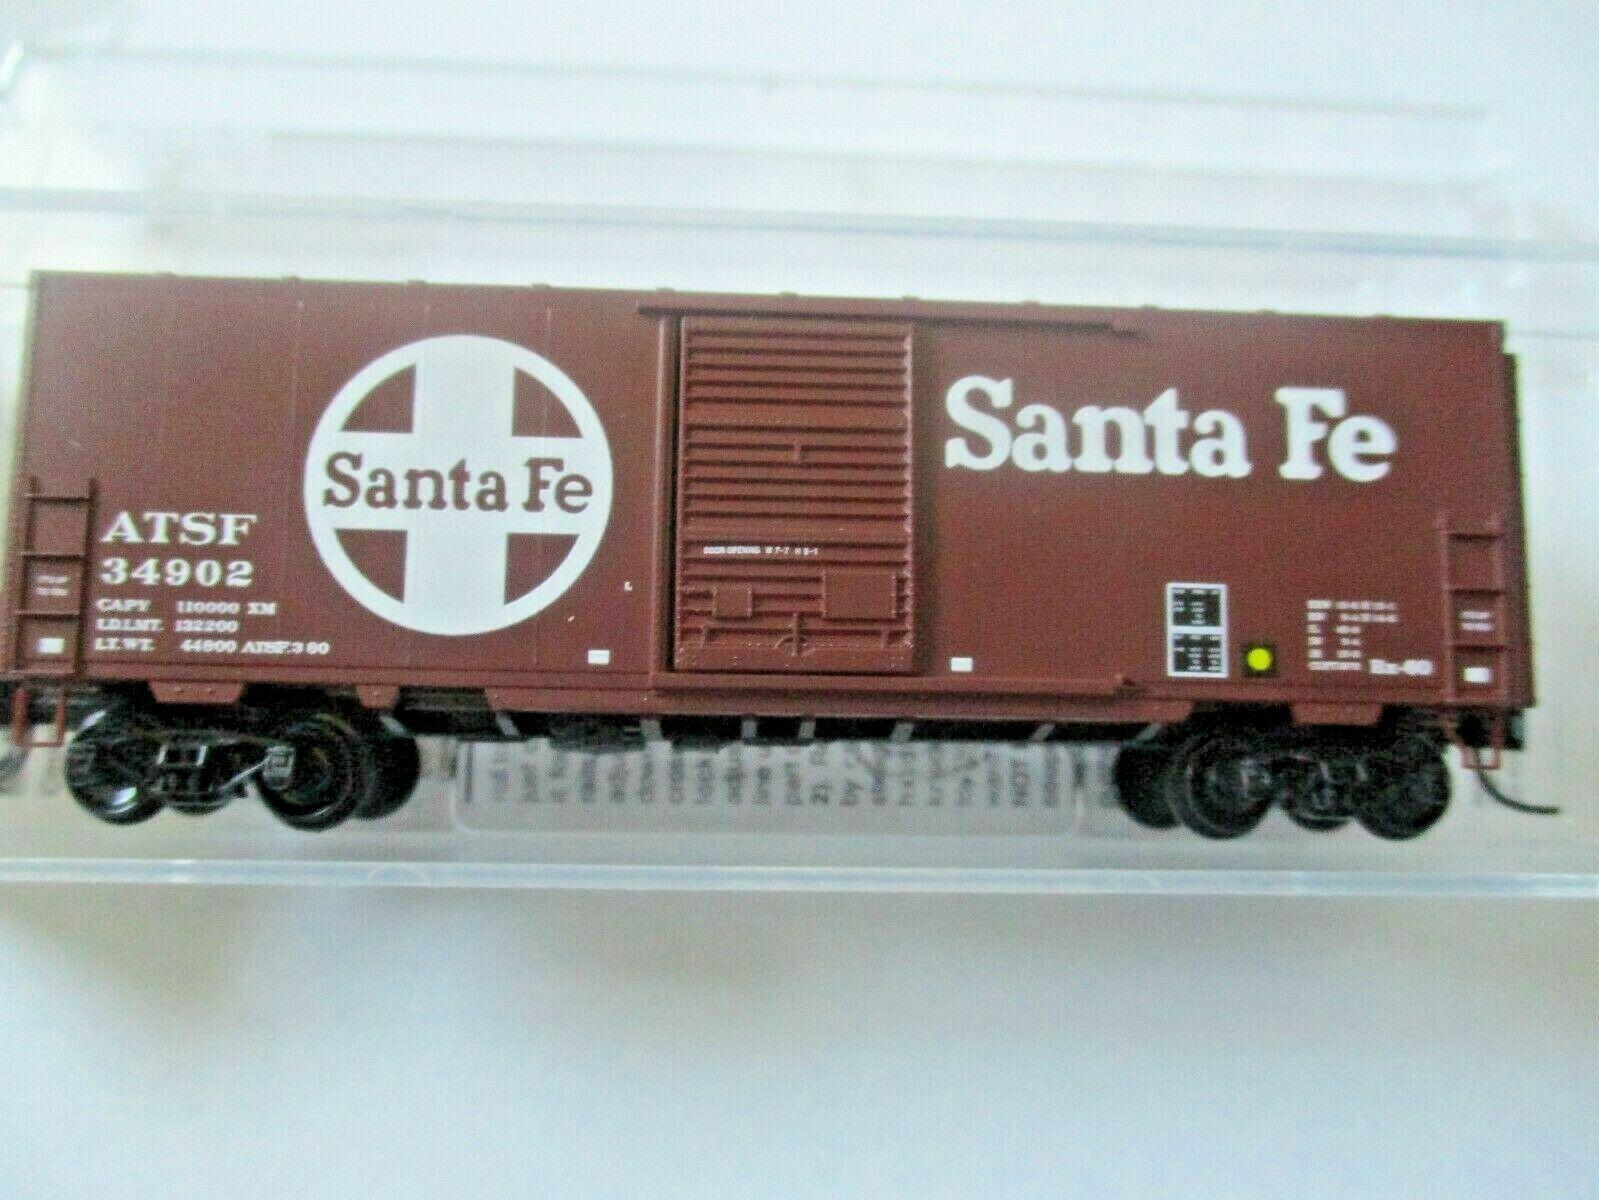 Micro-Trains # 07300560 Atchison, Topeka & Santa Fe 40' Standard Box Car N-Scale